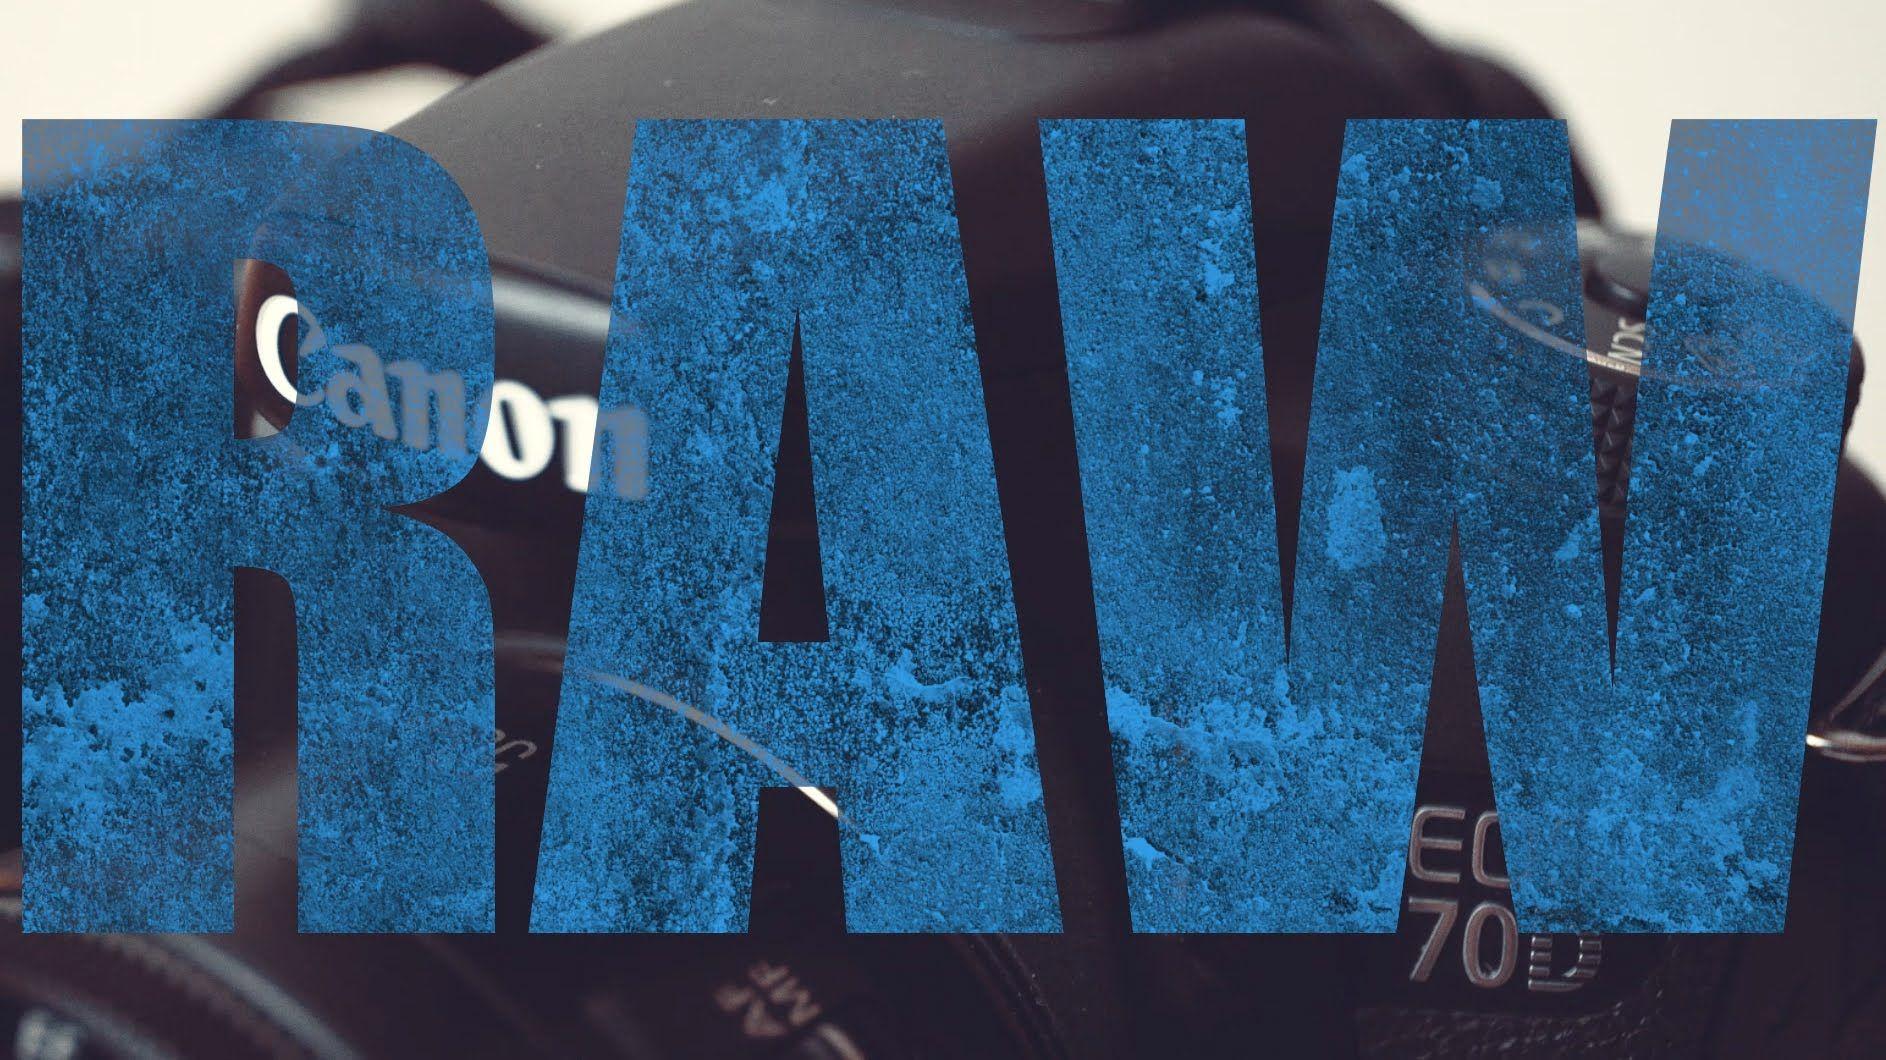 RAW Video on the Canon 70D (Magic Lantern) | Canon 70D | Canon 70d